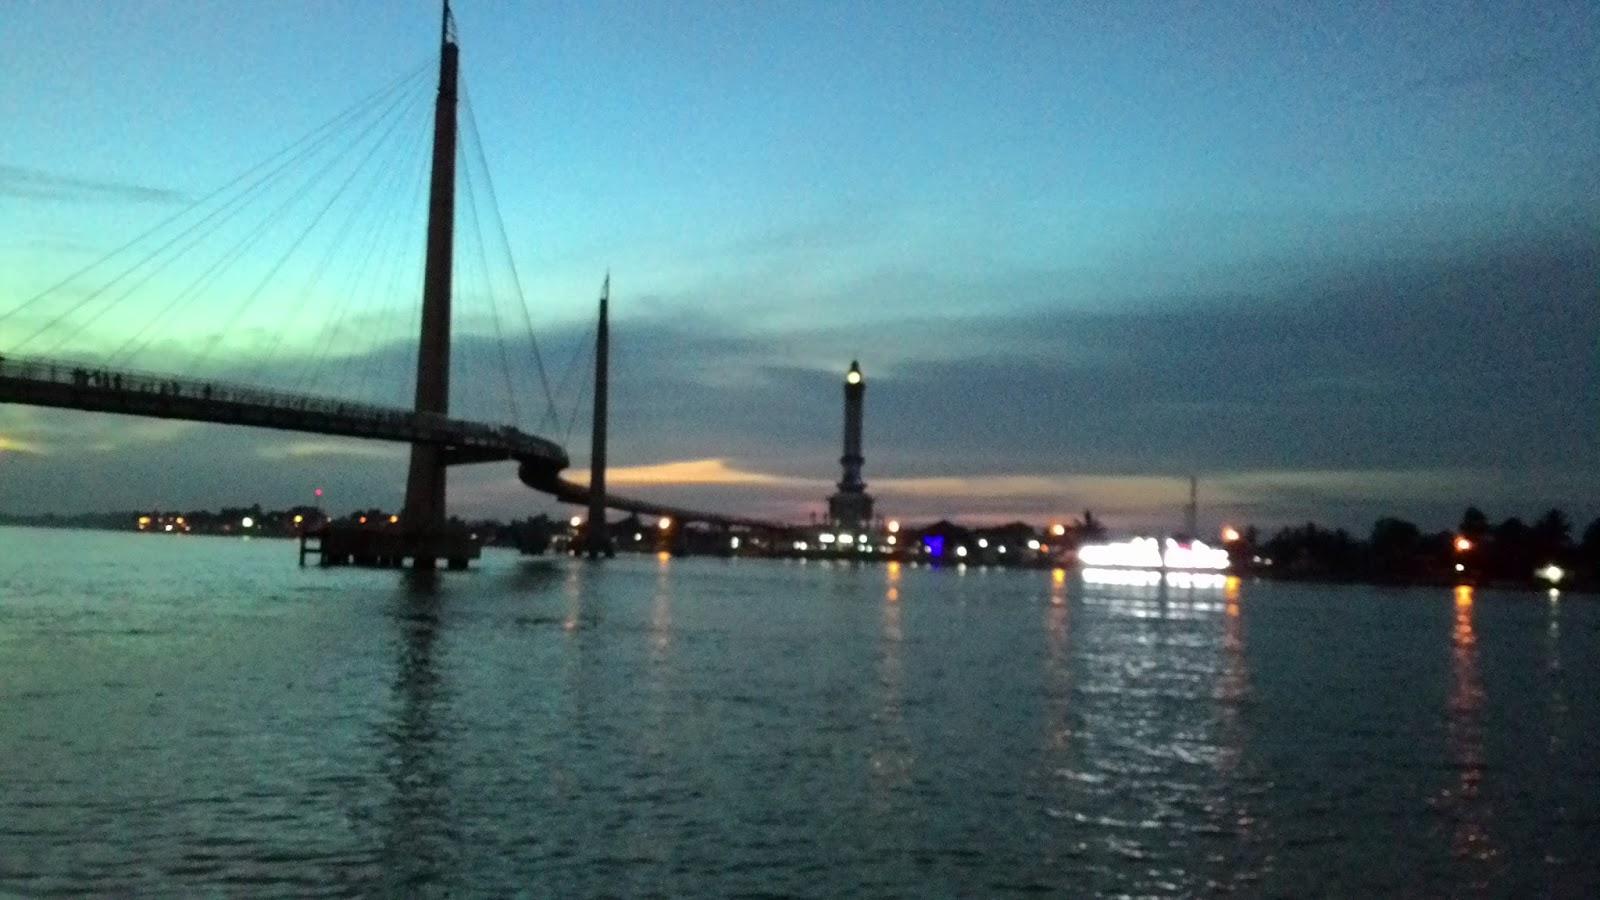 Jembatan Pedestrian Menara Gentala Arasy Coretan Anak Bangsa P 20150430